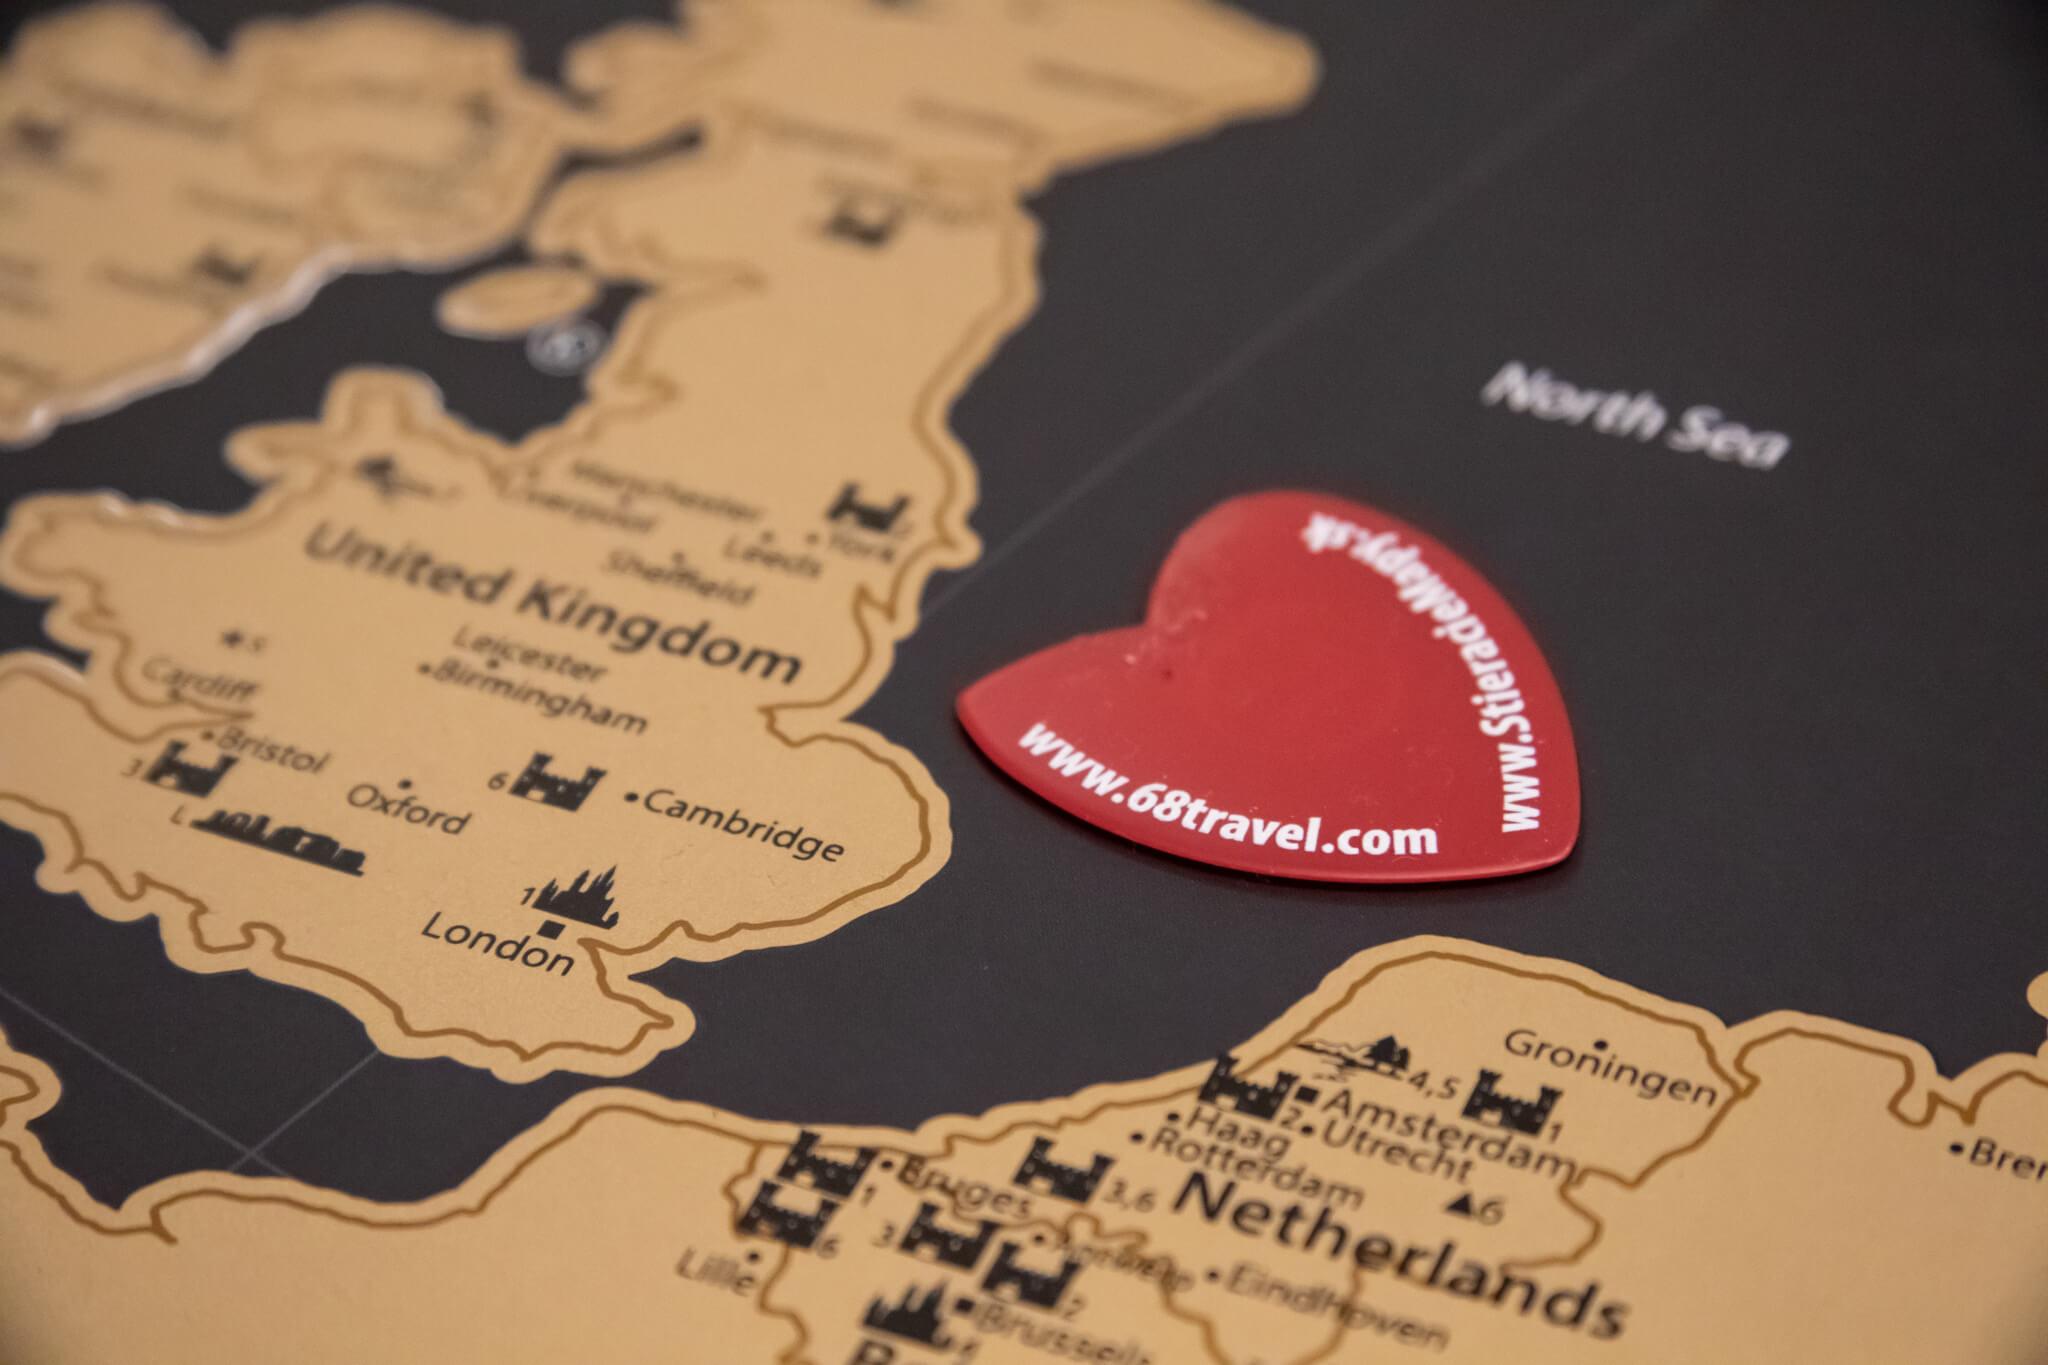 Scratch Map of Europe - Detail of scratcher